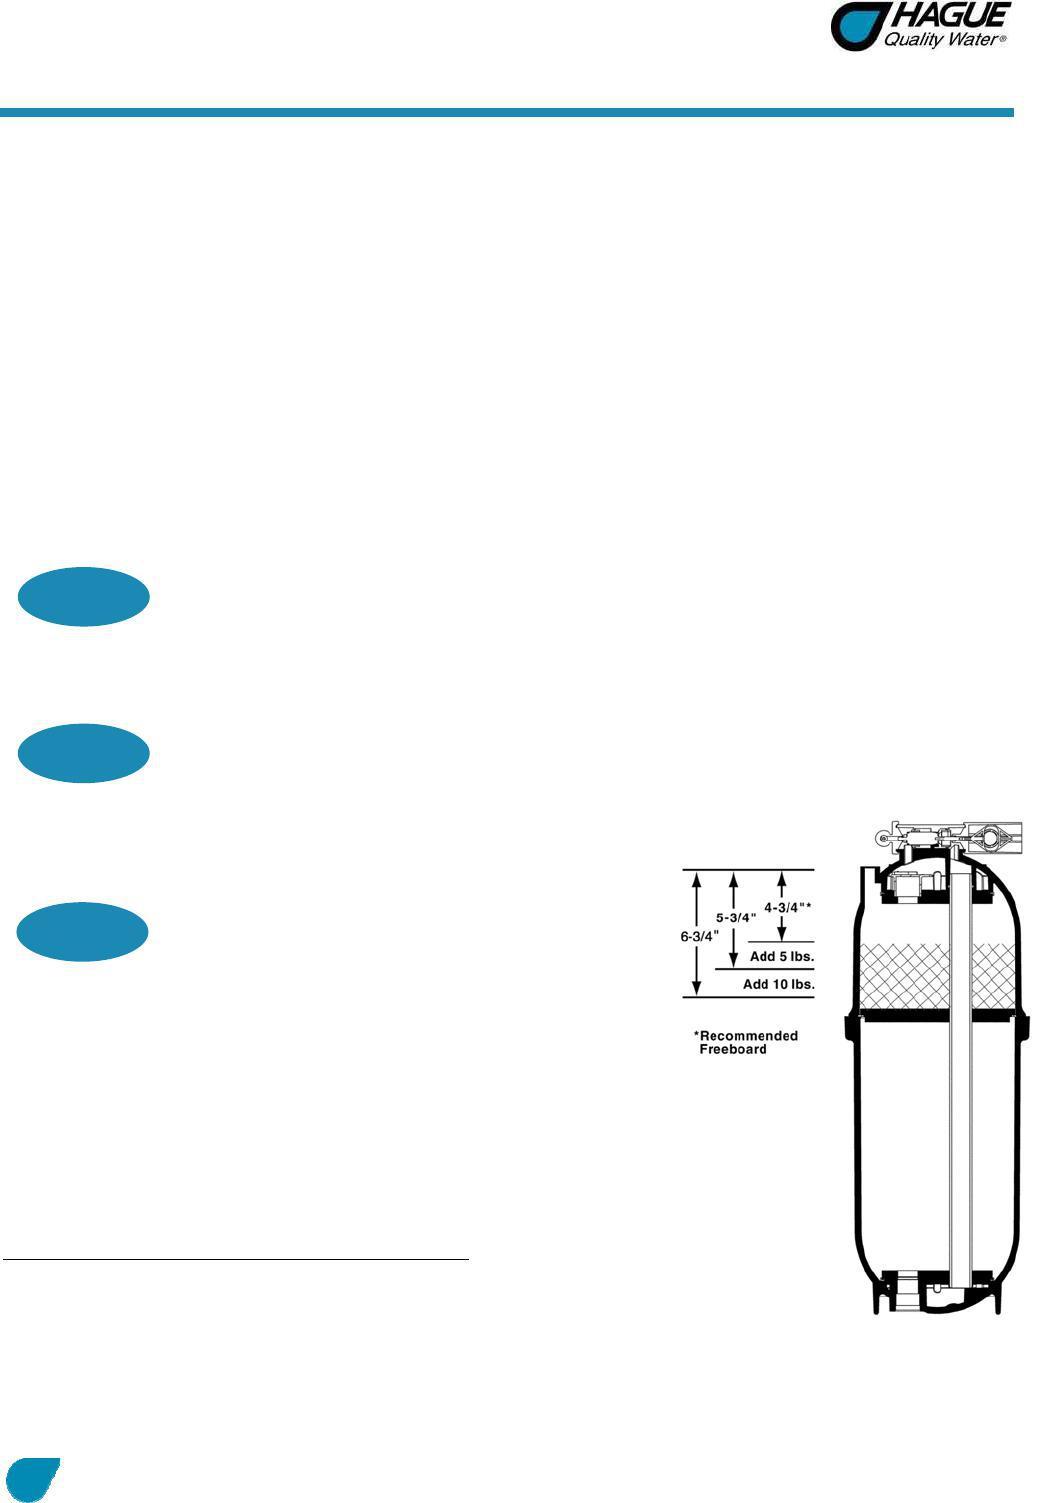 Hague Quality Water Intl Watermax 61aan 62ajq 62amq 62apq Manual Guide